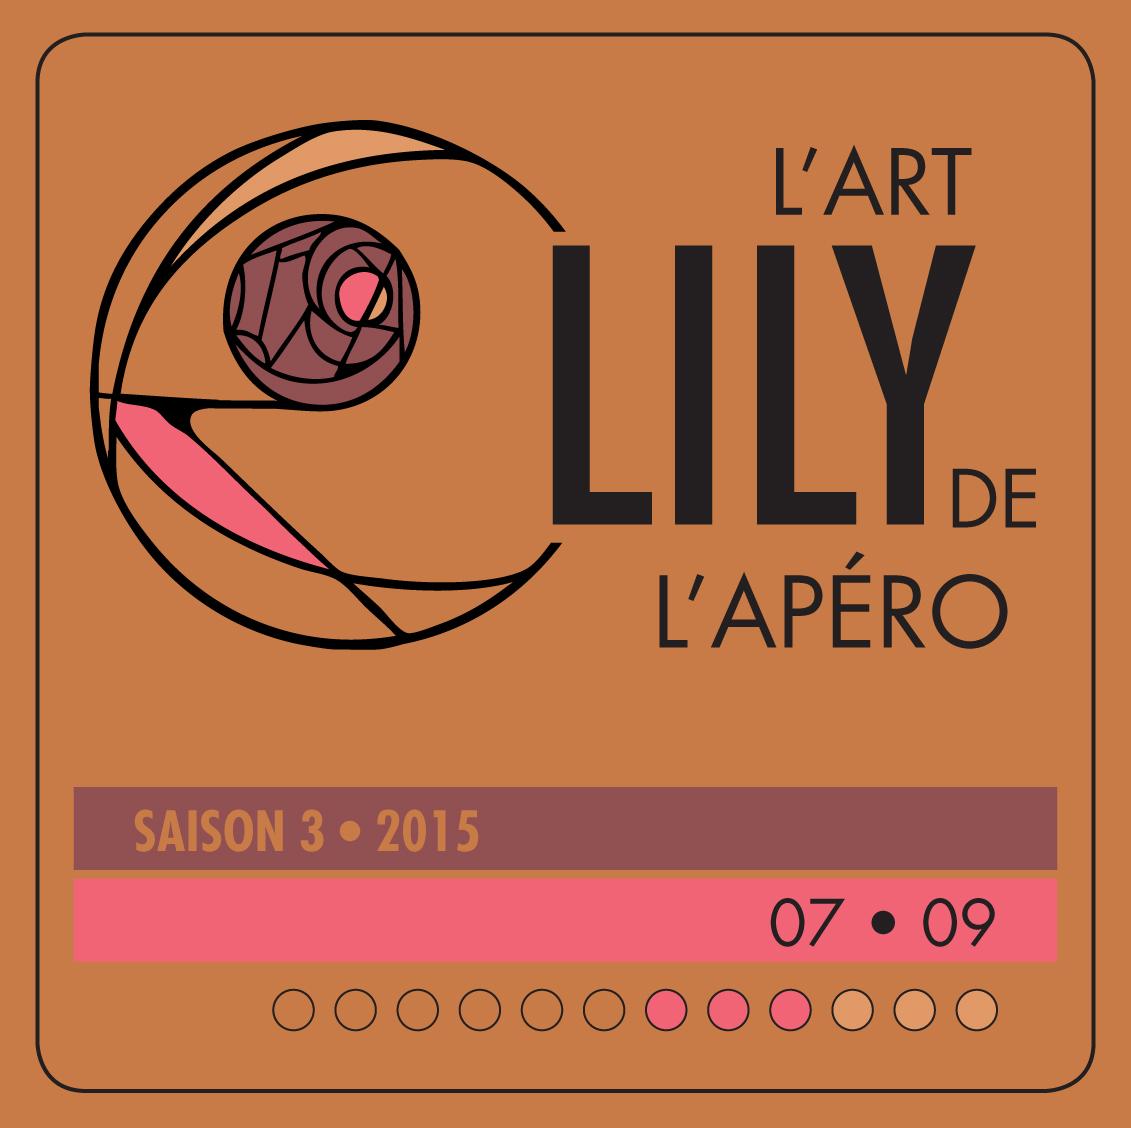 Flyer LILY - Saison 3